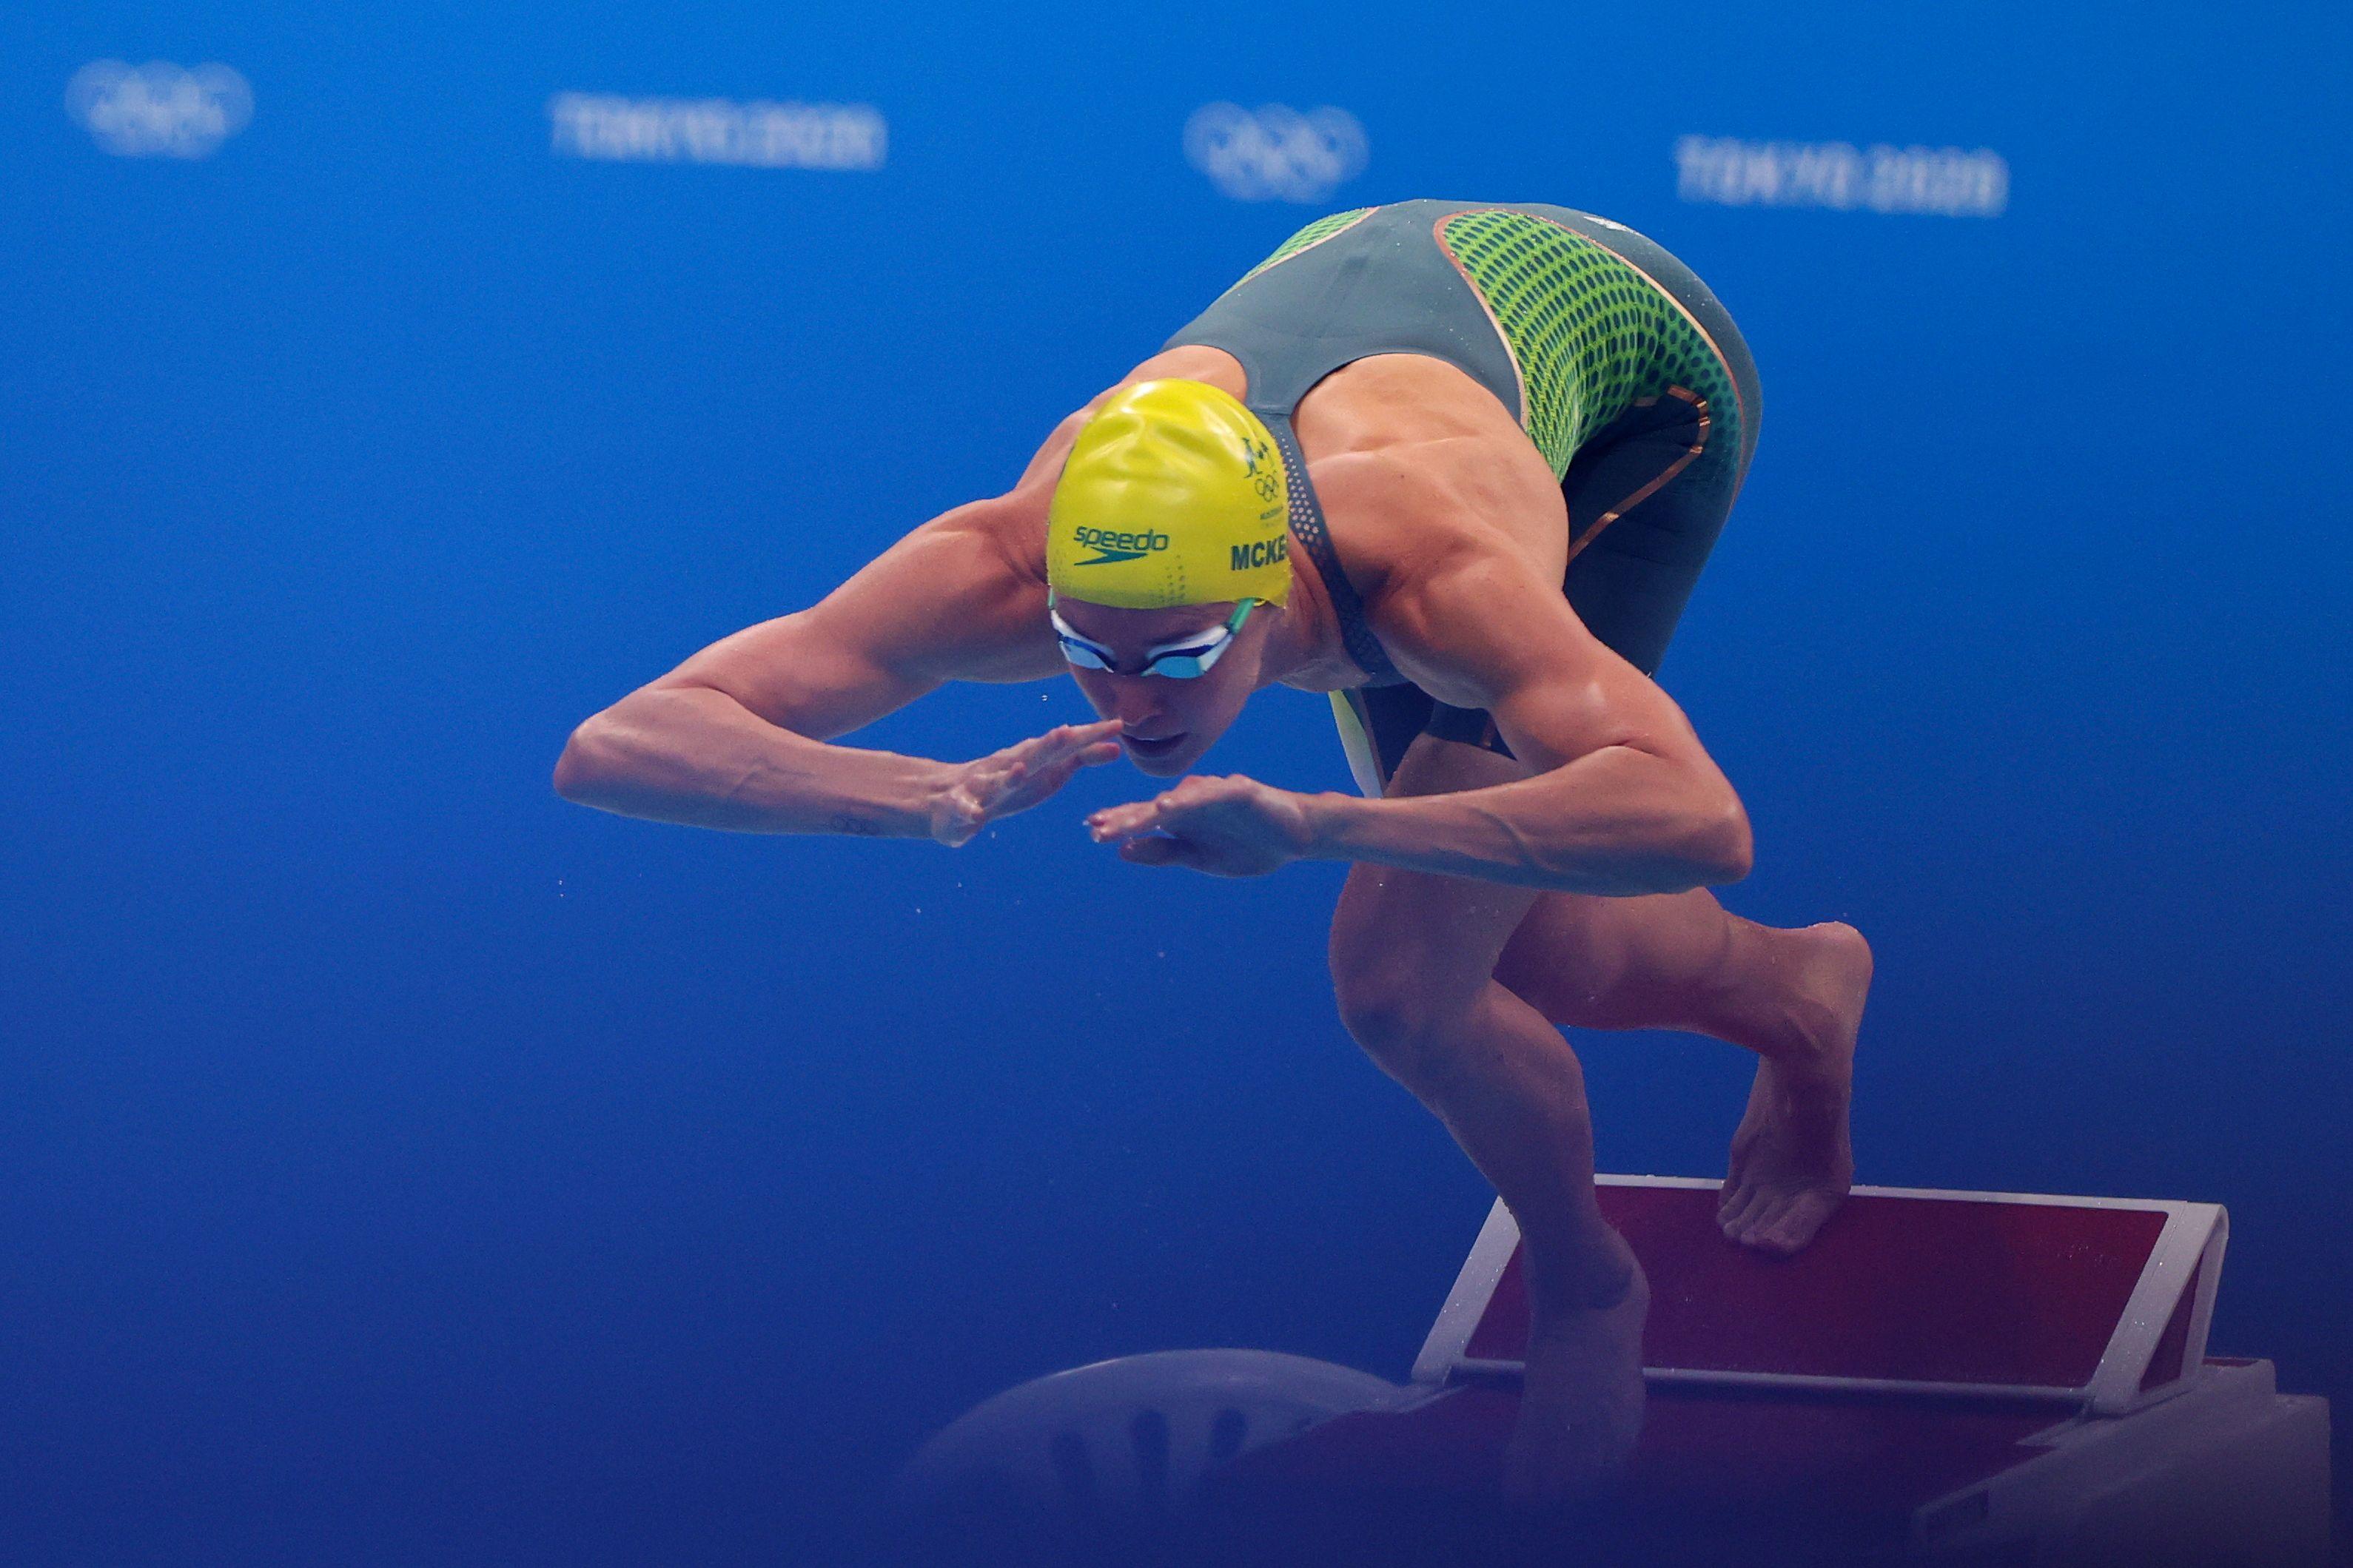 Tokyo 2020 Olympics - Swimming - Women's 50m Freestyle - Heats - Tokyo Aquatics Centre - Tokyo, Japan - July 30, 2021. Emma McKeon of Australia in action REUTERS/Marko Djurica